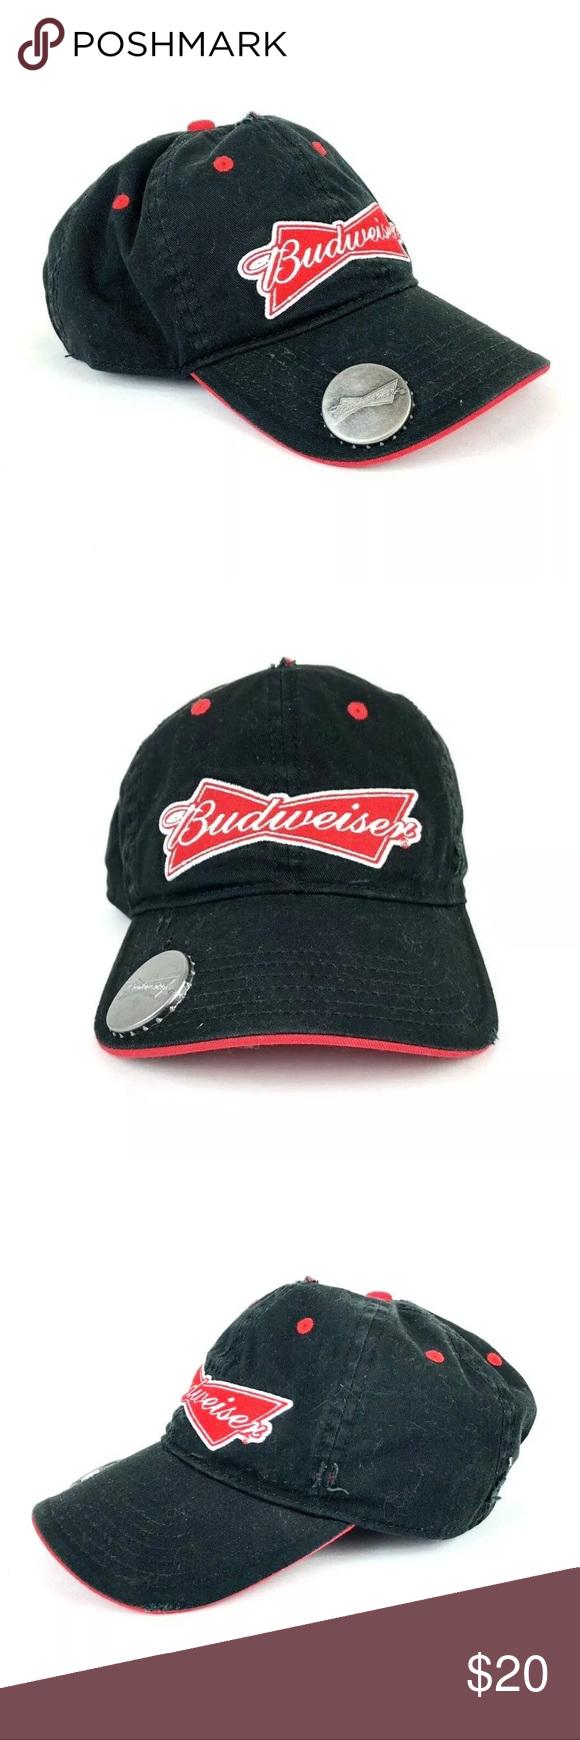 dd6d568978adf Budweiser Beer Bootle Opener Cap Mens Hat Budweiser Cap w  Bottle Opener  Brand New Without Tags Budweiser Accessories Hats